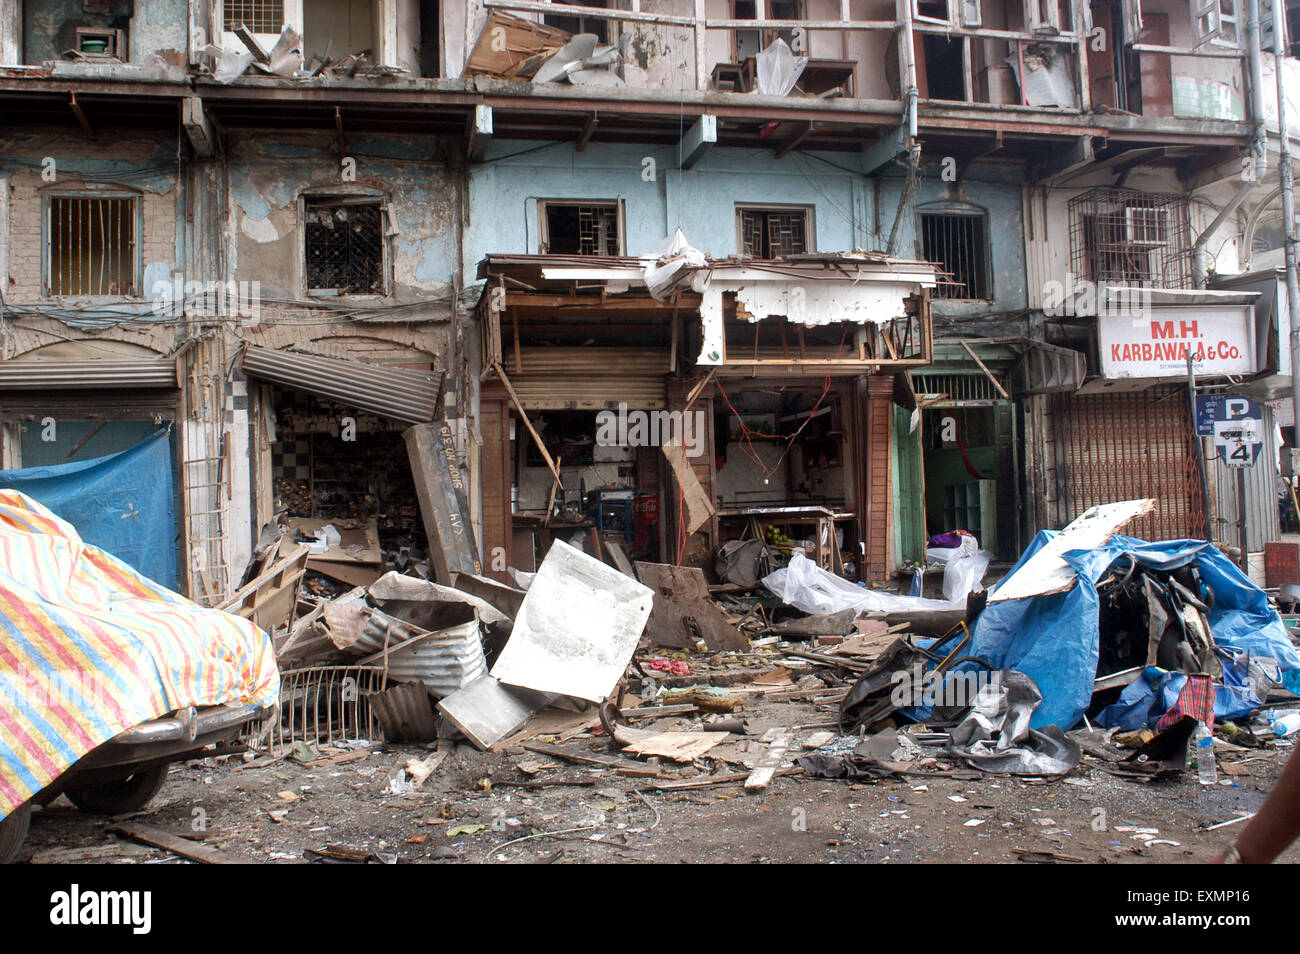 Shops damaged by powerful explosives bomb blast Zaveri Bazaar Kalbadevi Bombay Mumbai Maharashtra India - Stock Image